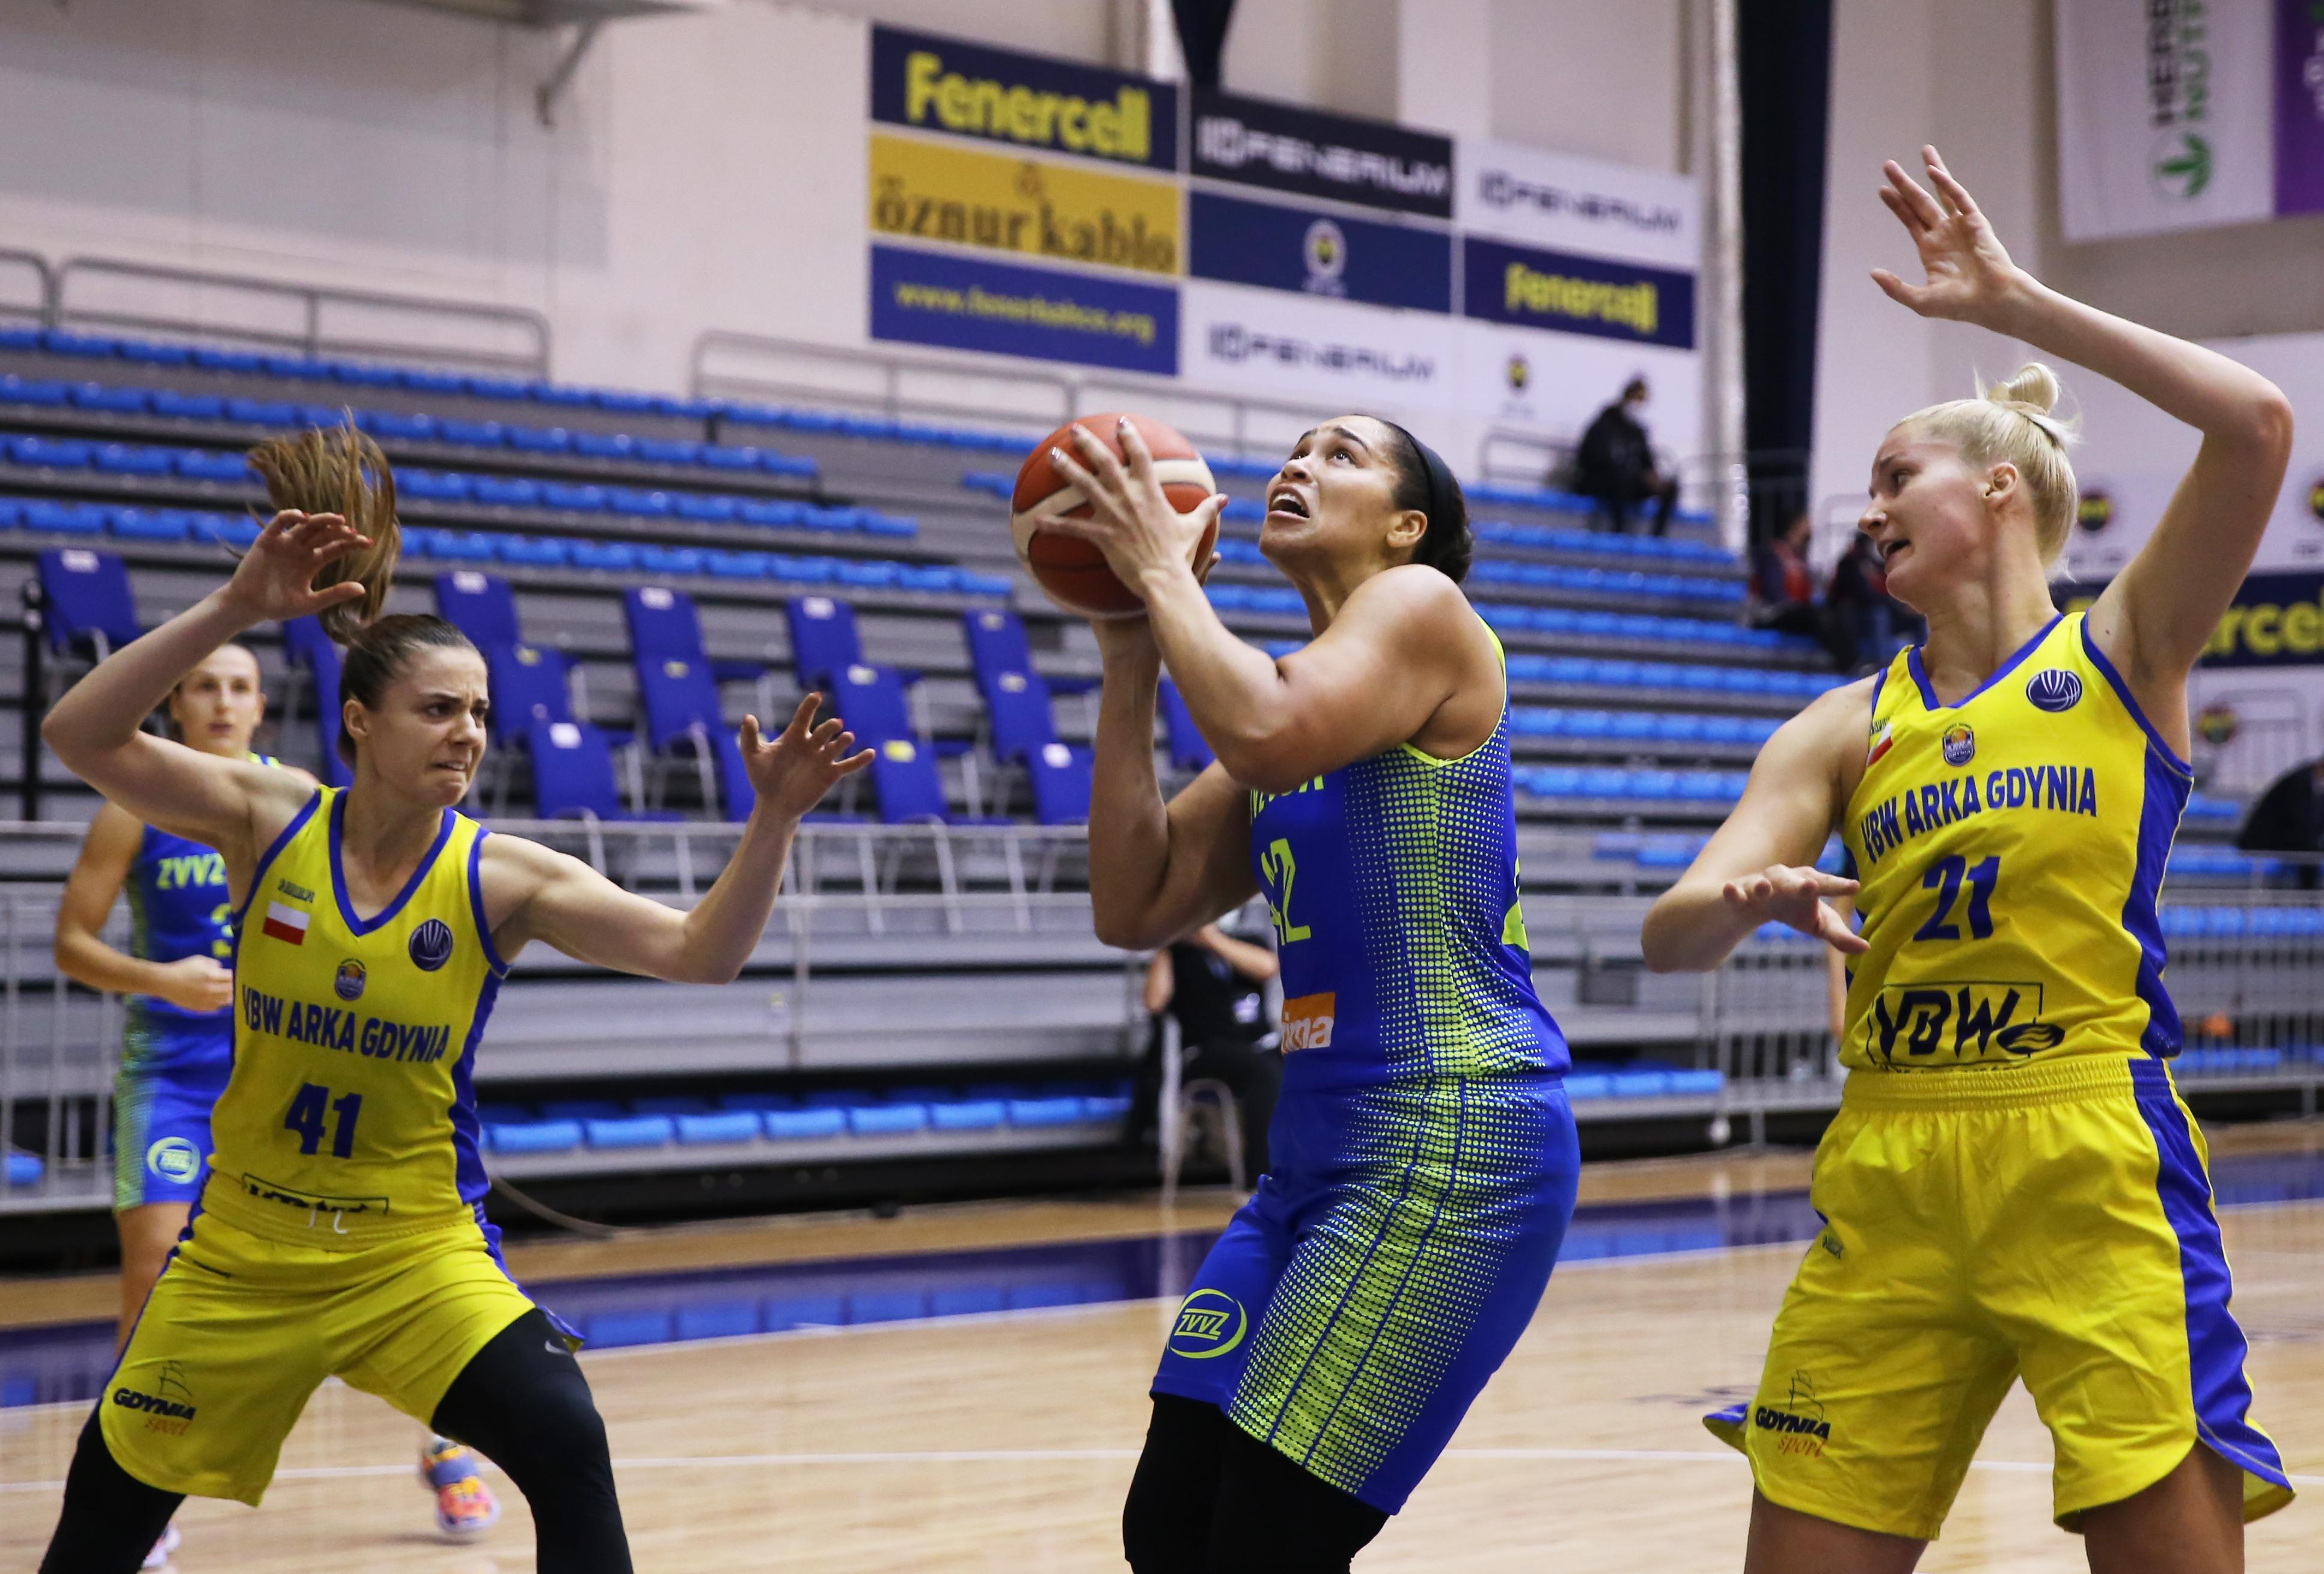 Arka Gdynia v USK Prag - FIBA Women Eurobasket